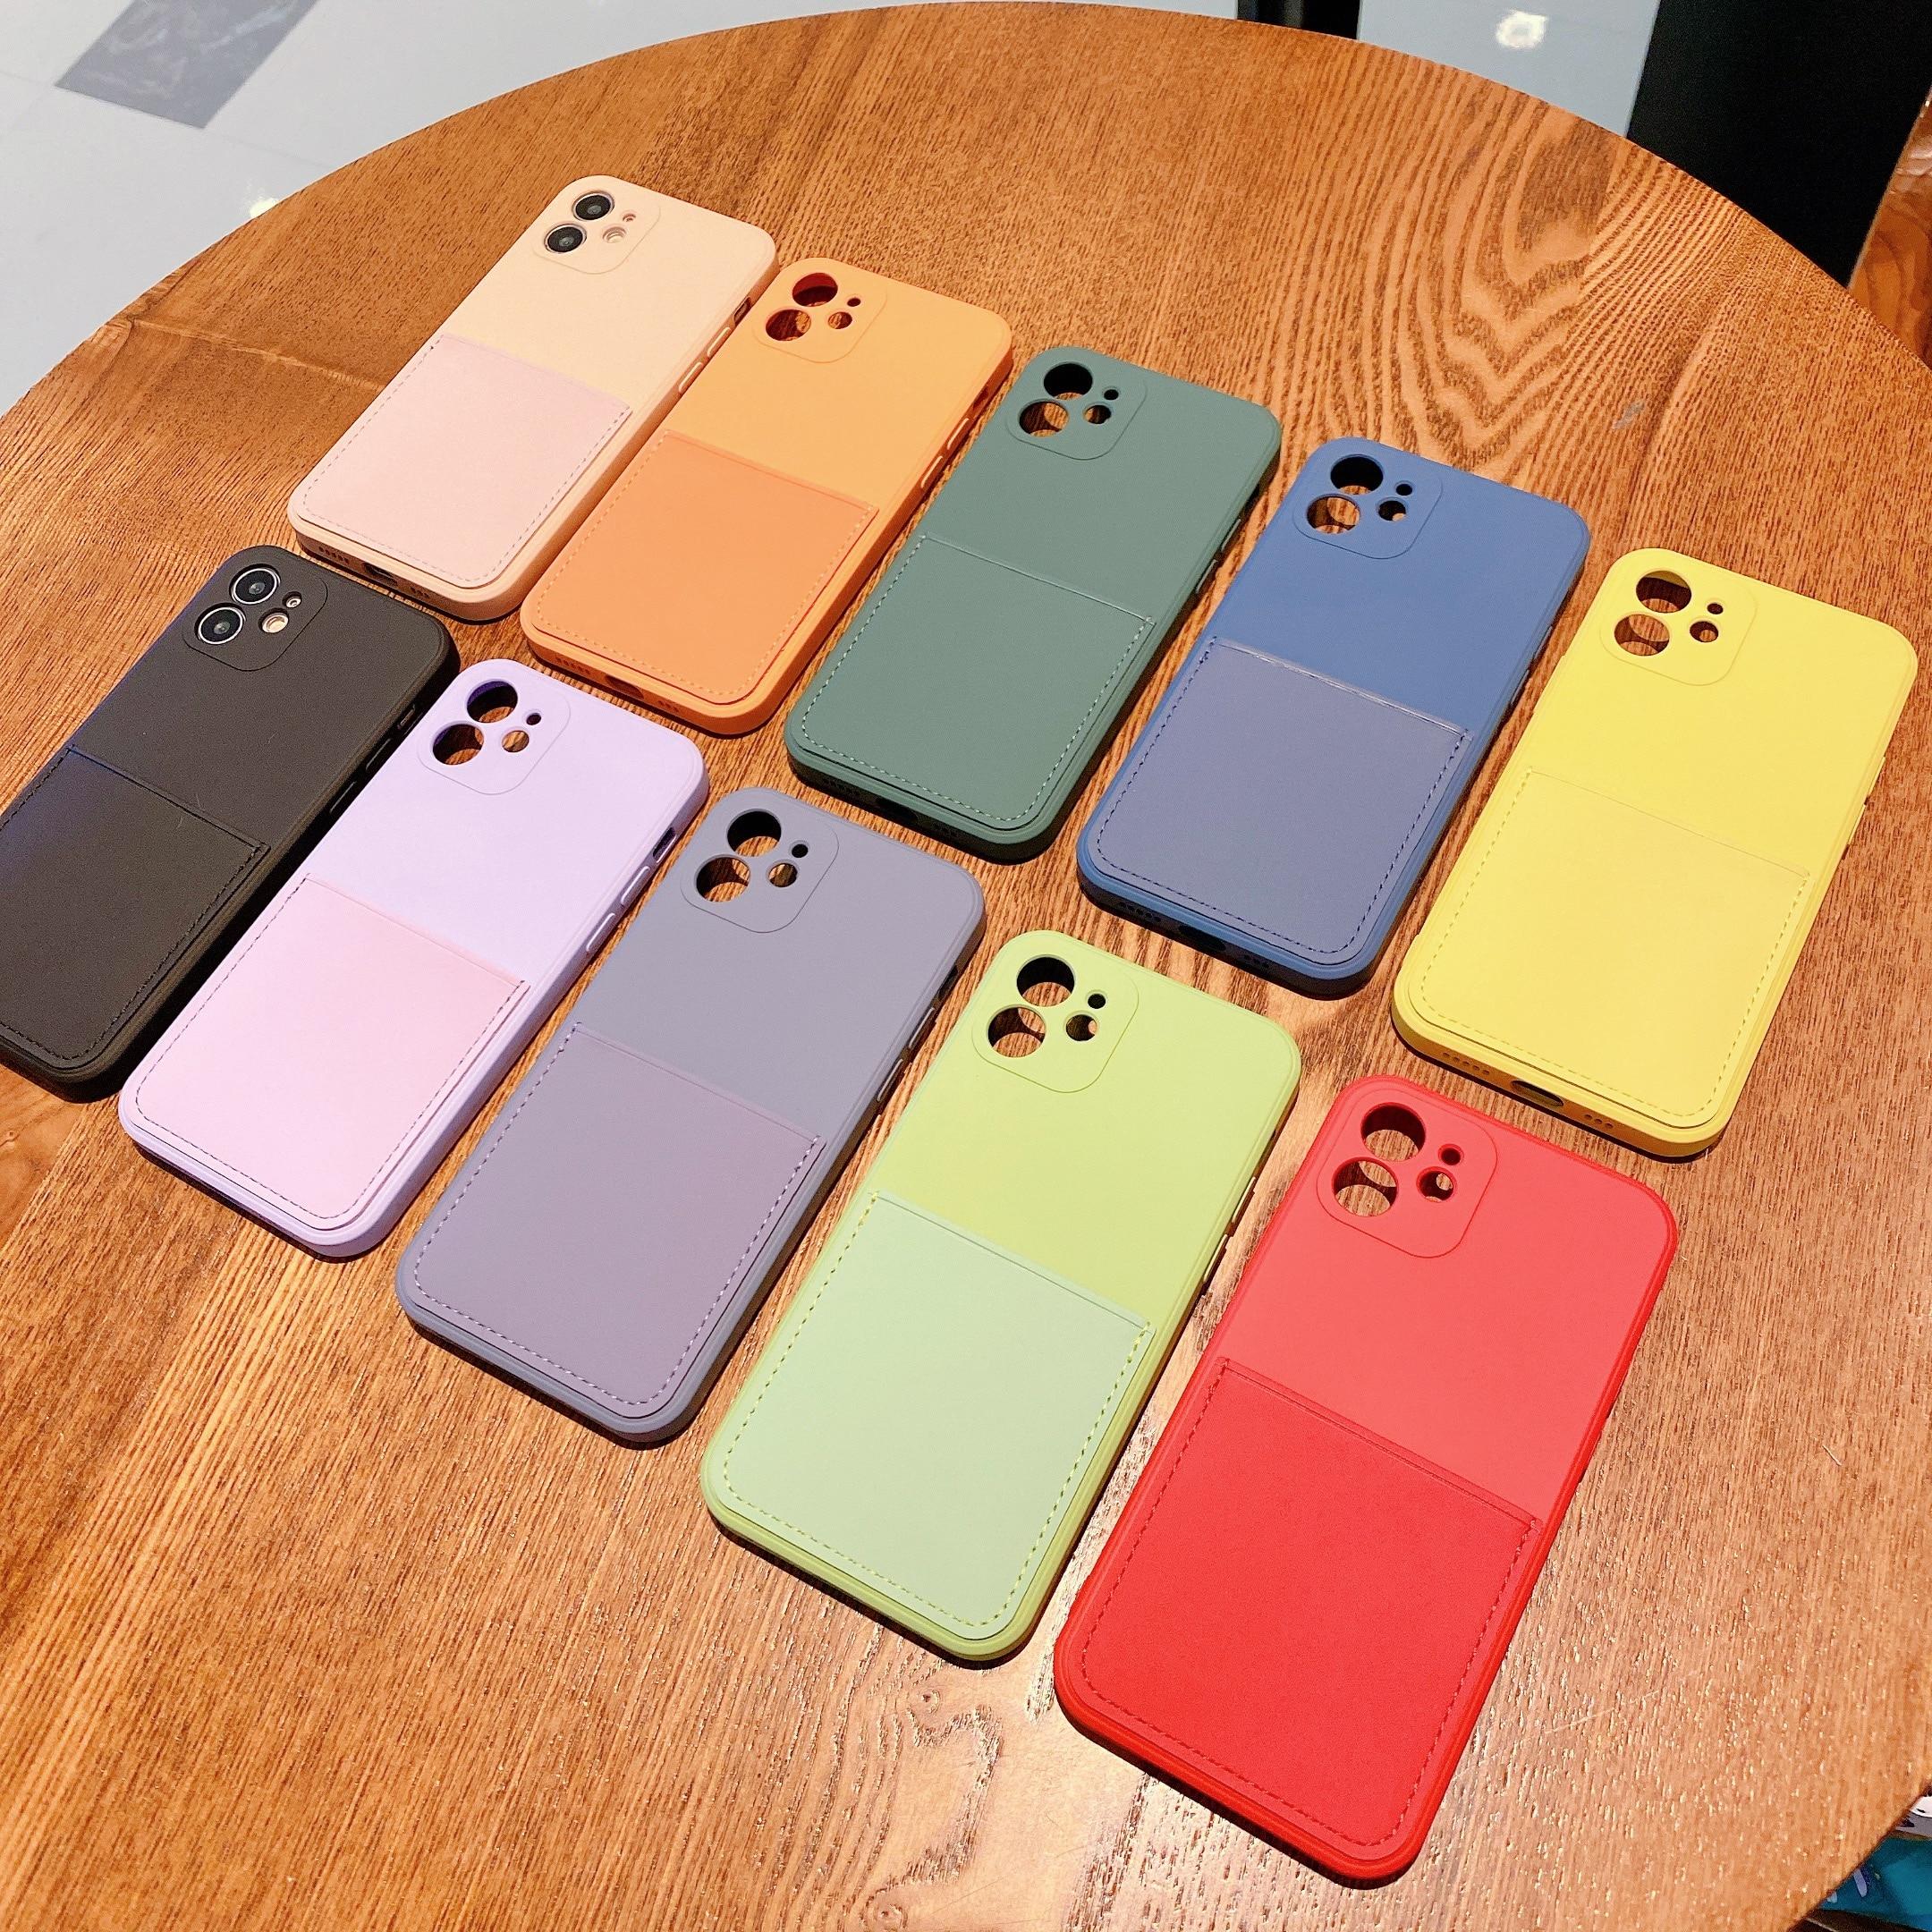 Liquid Silicone Luxury Case For Apple iPhone 11 12 Pro Max mini SE 2020 X XR XS Max 7 8 Plus Card St